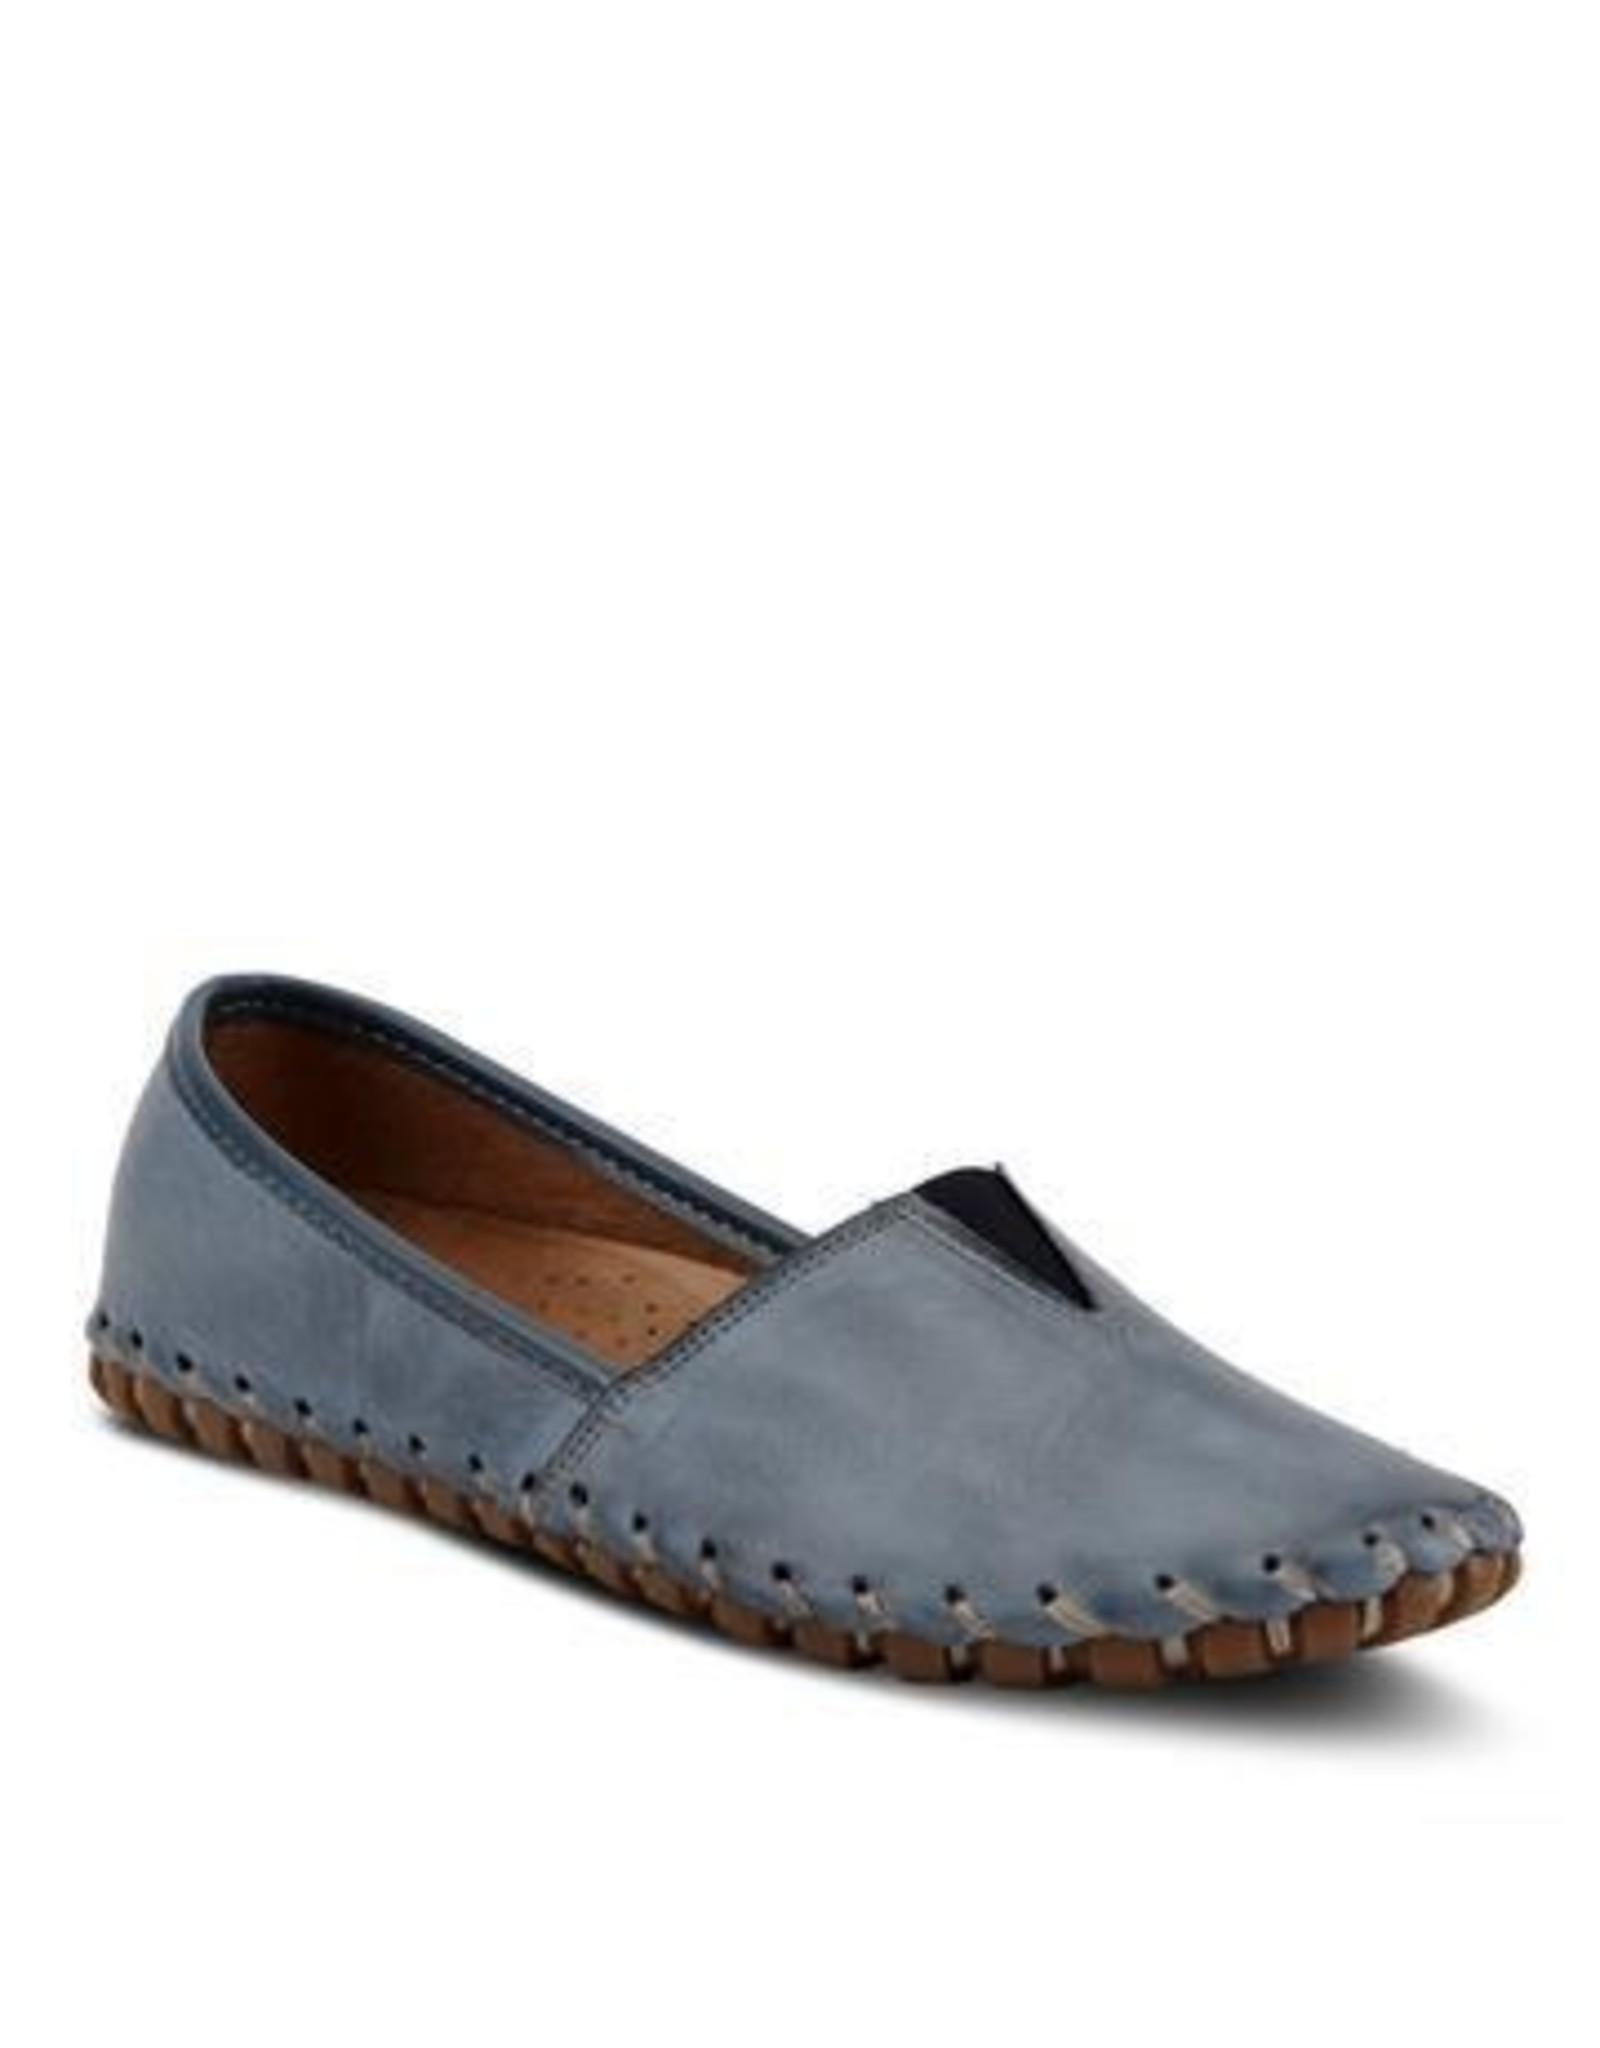 Kathaleta Leather Shoe